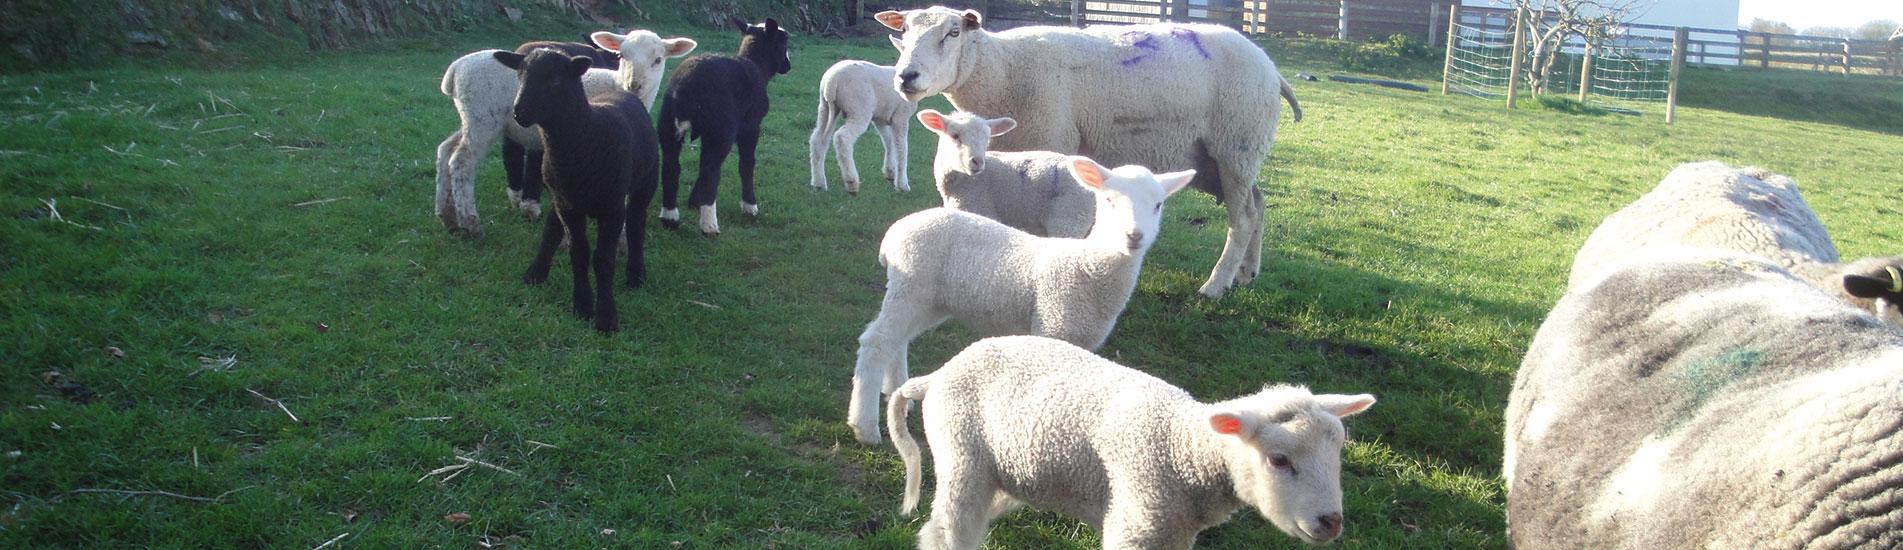 Sheep at Kimbland Farm, Devon